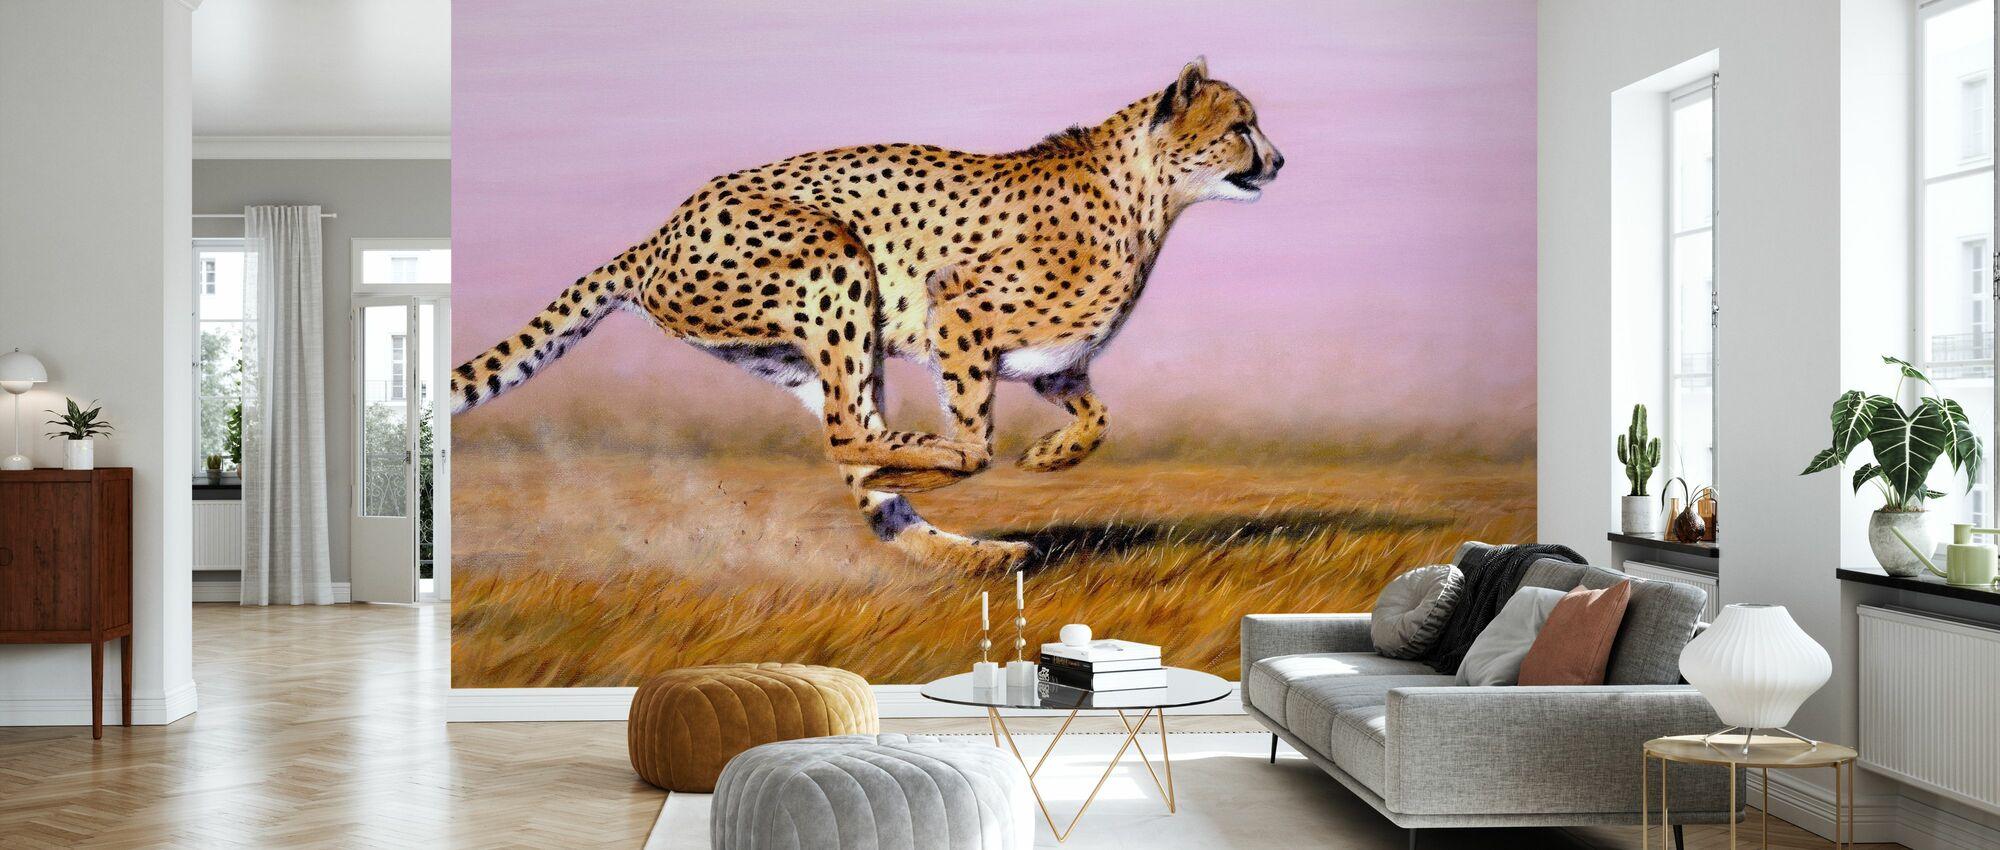 Cheetah - Wallpaper - Living Room